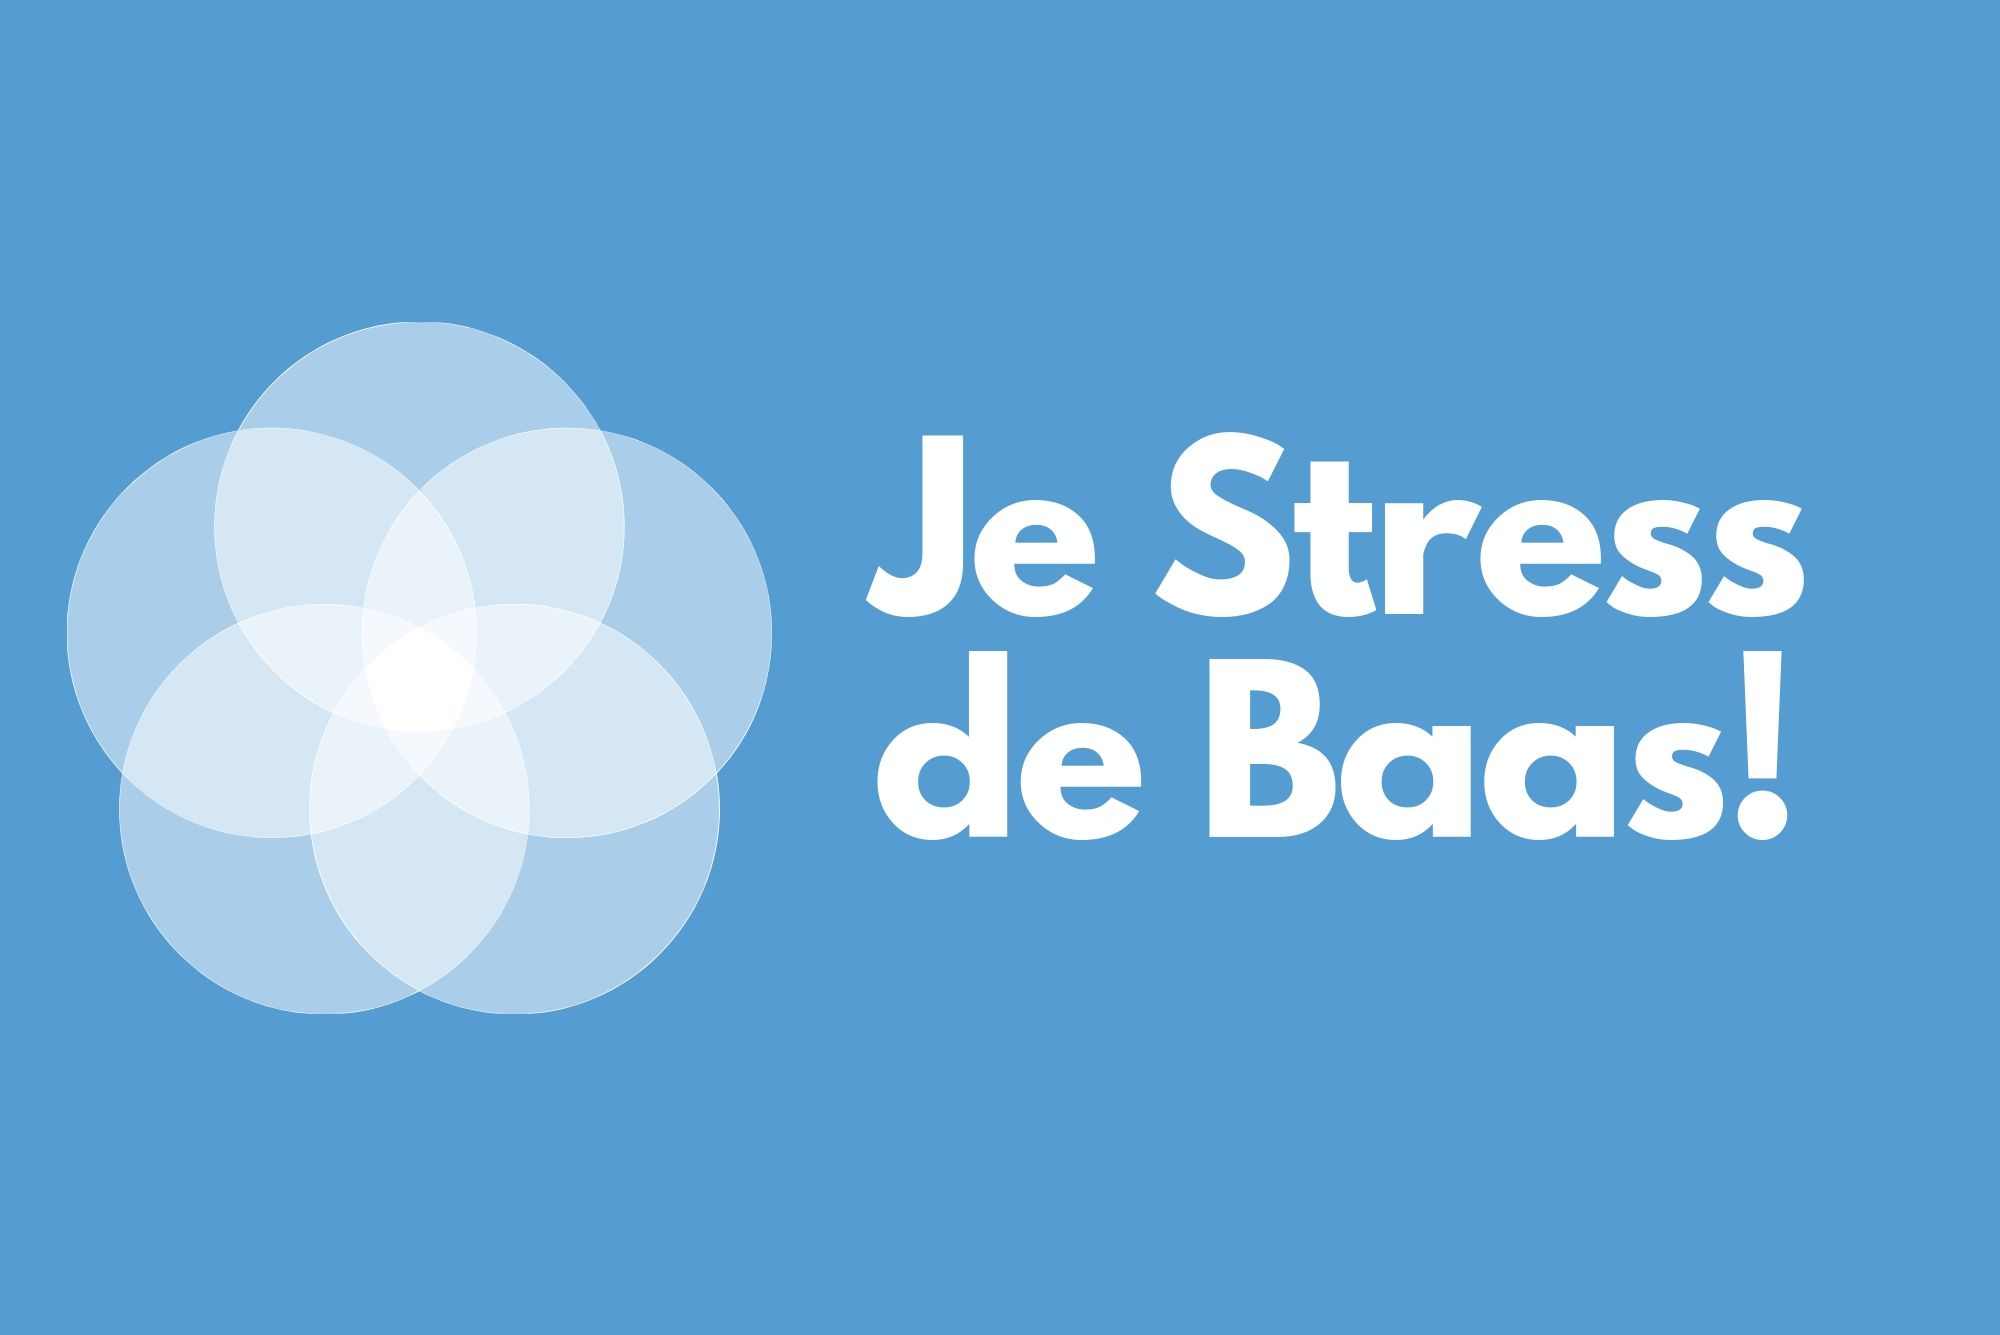 je stress de baas logo